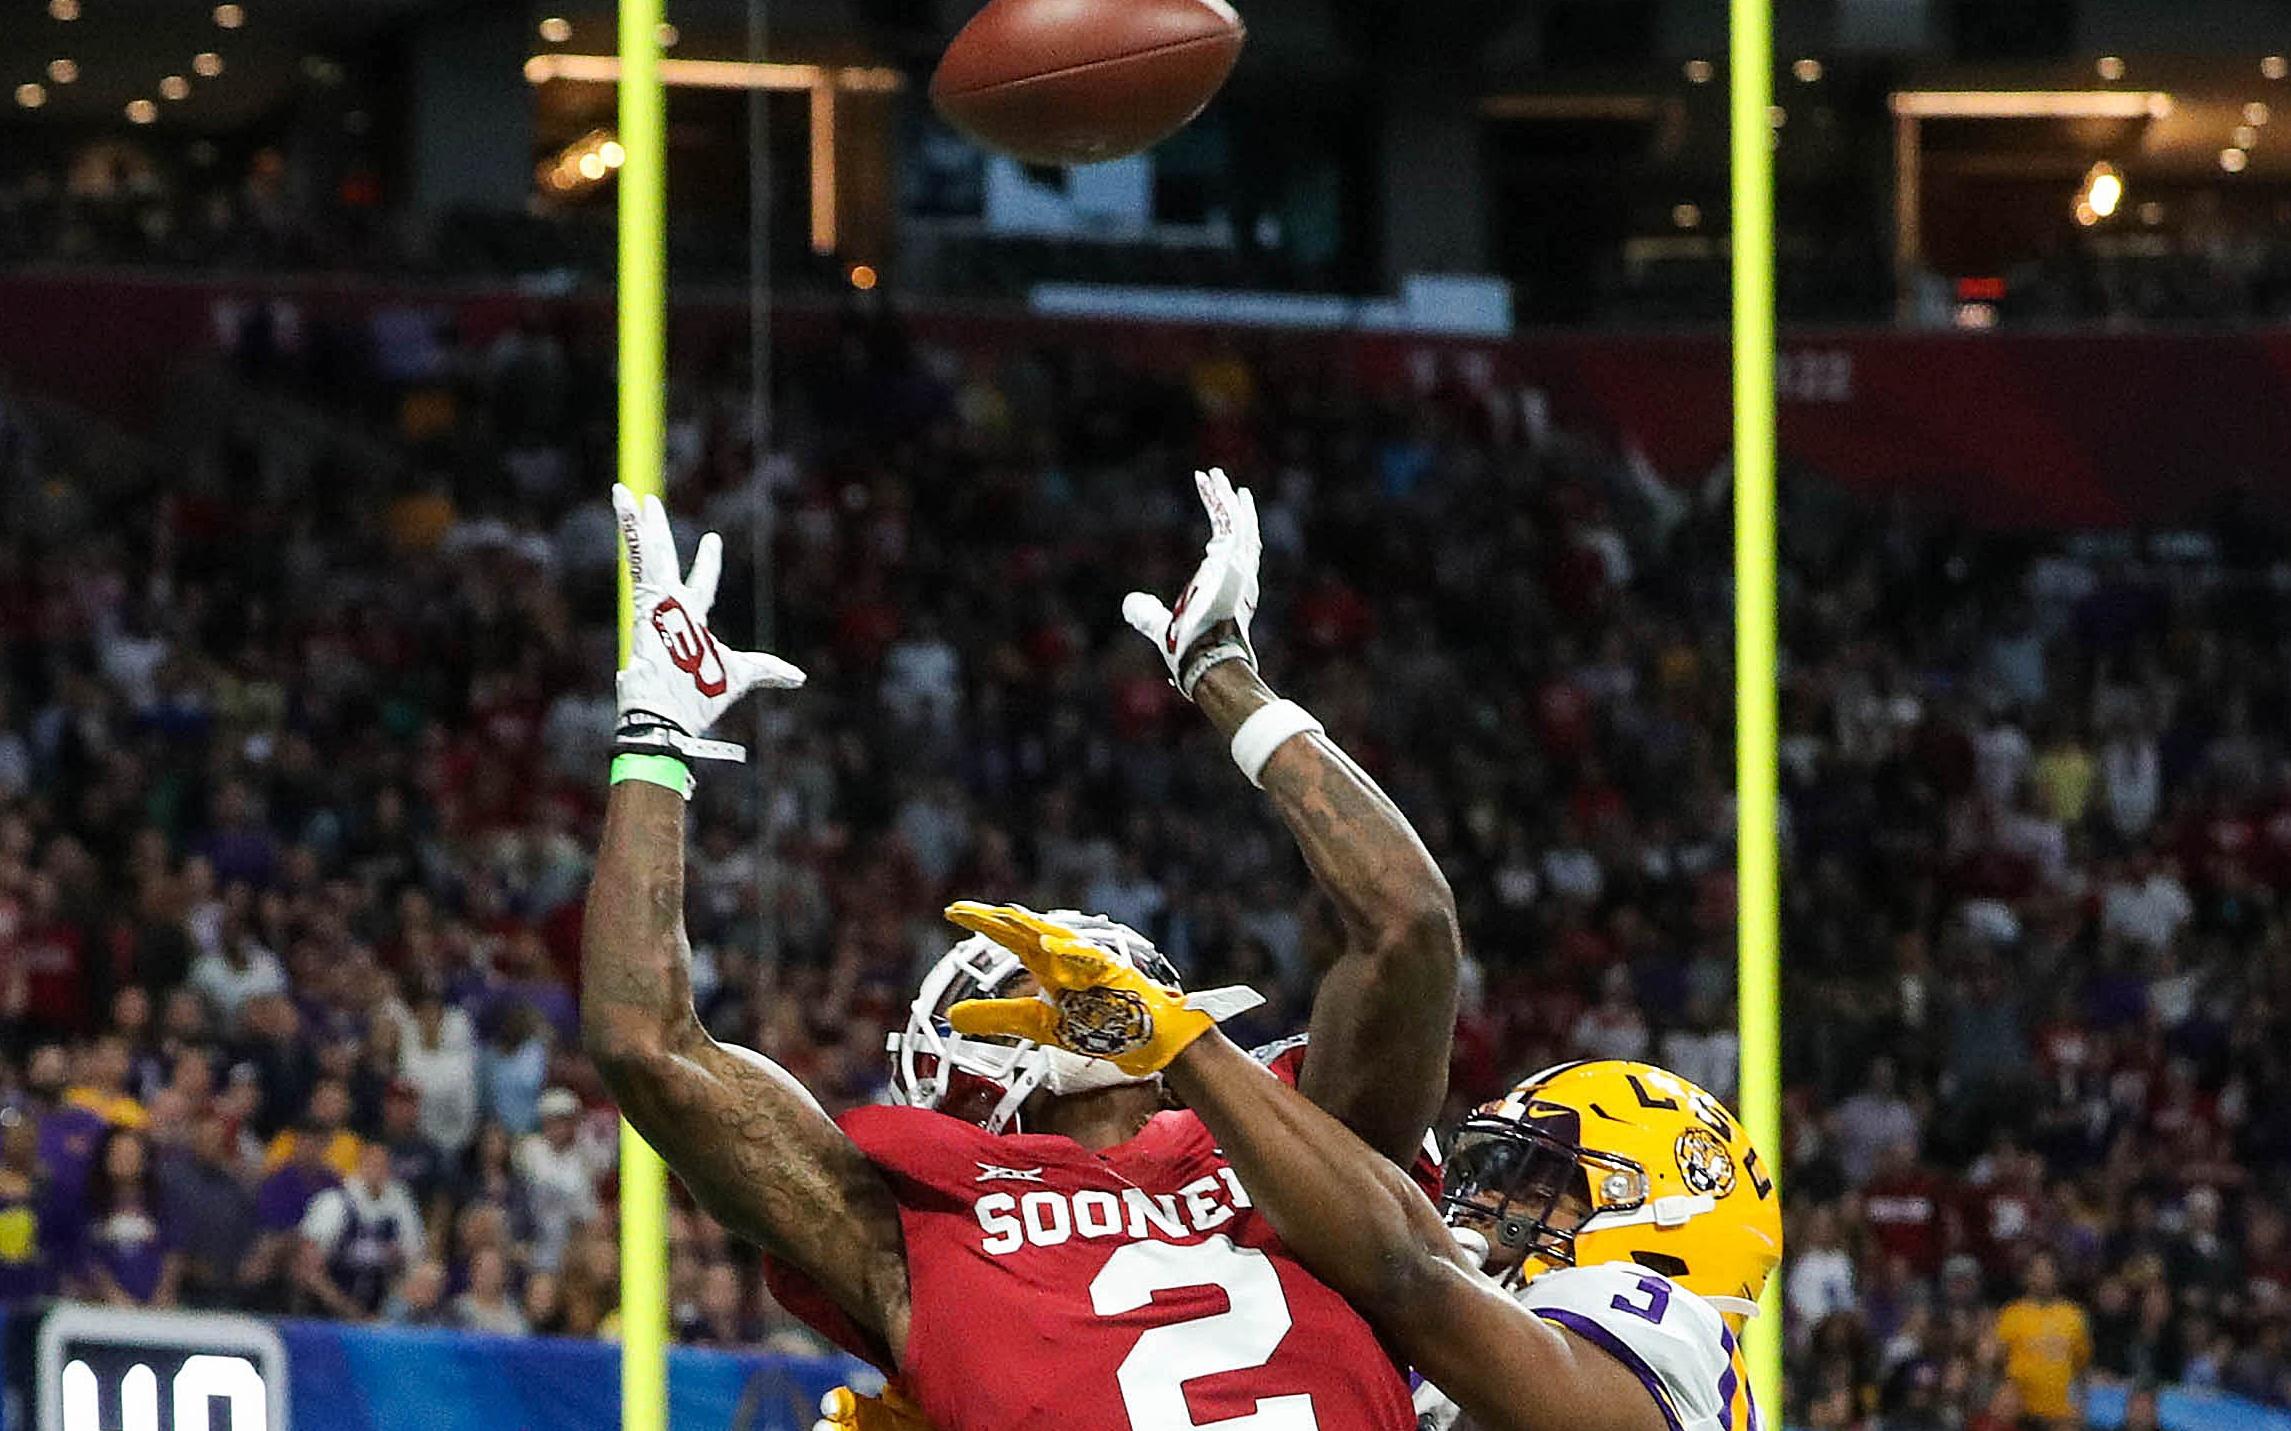 CeeDee Lamb. Credit: Jason Getz, USA TODAY Sports.